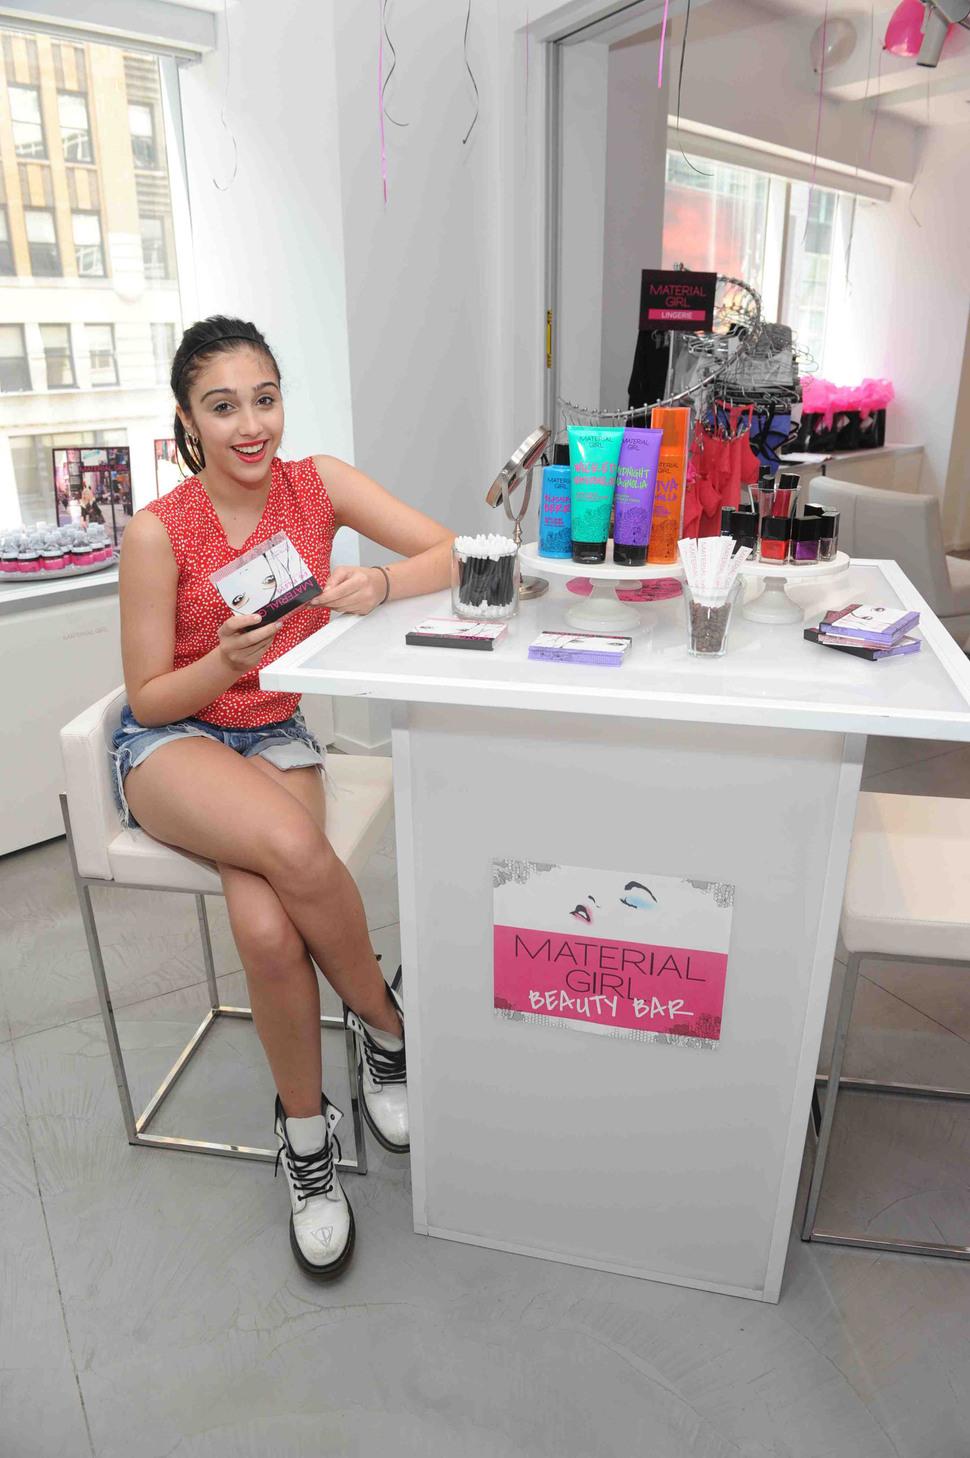 Лурдес Леон представила косметическую линию Material Girl